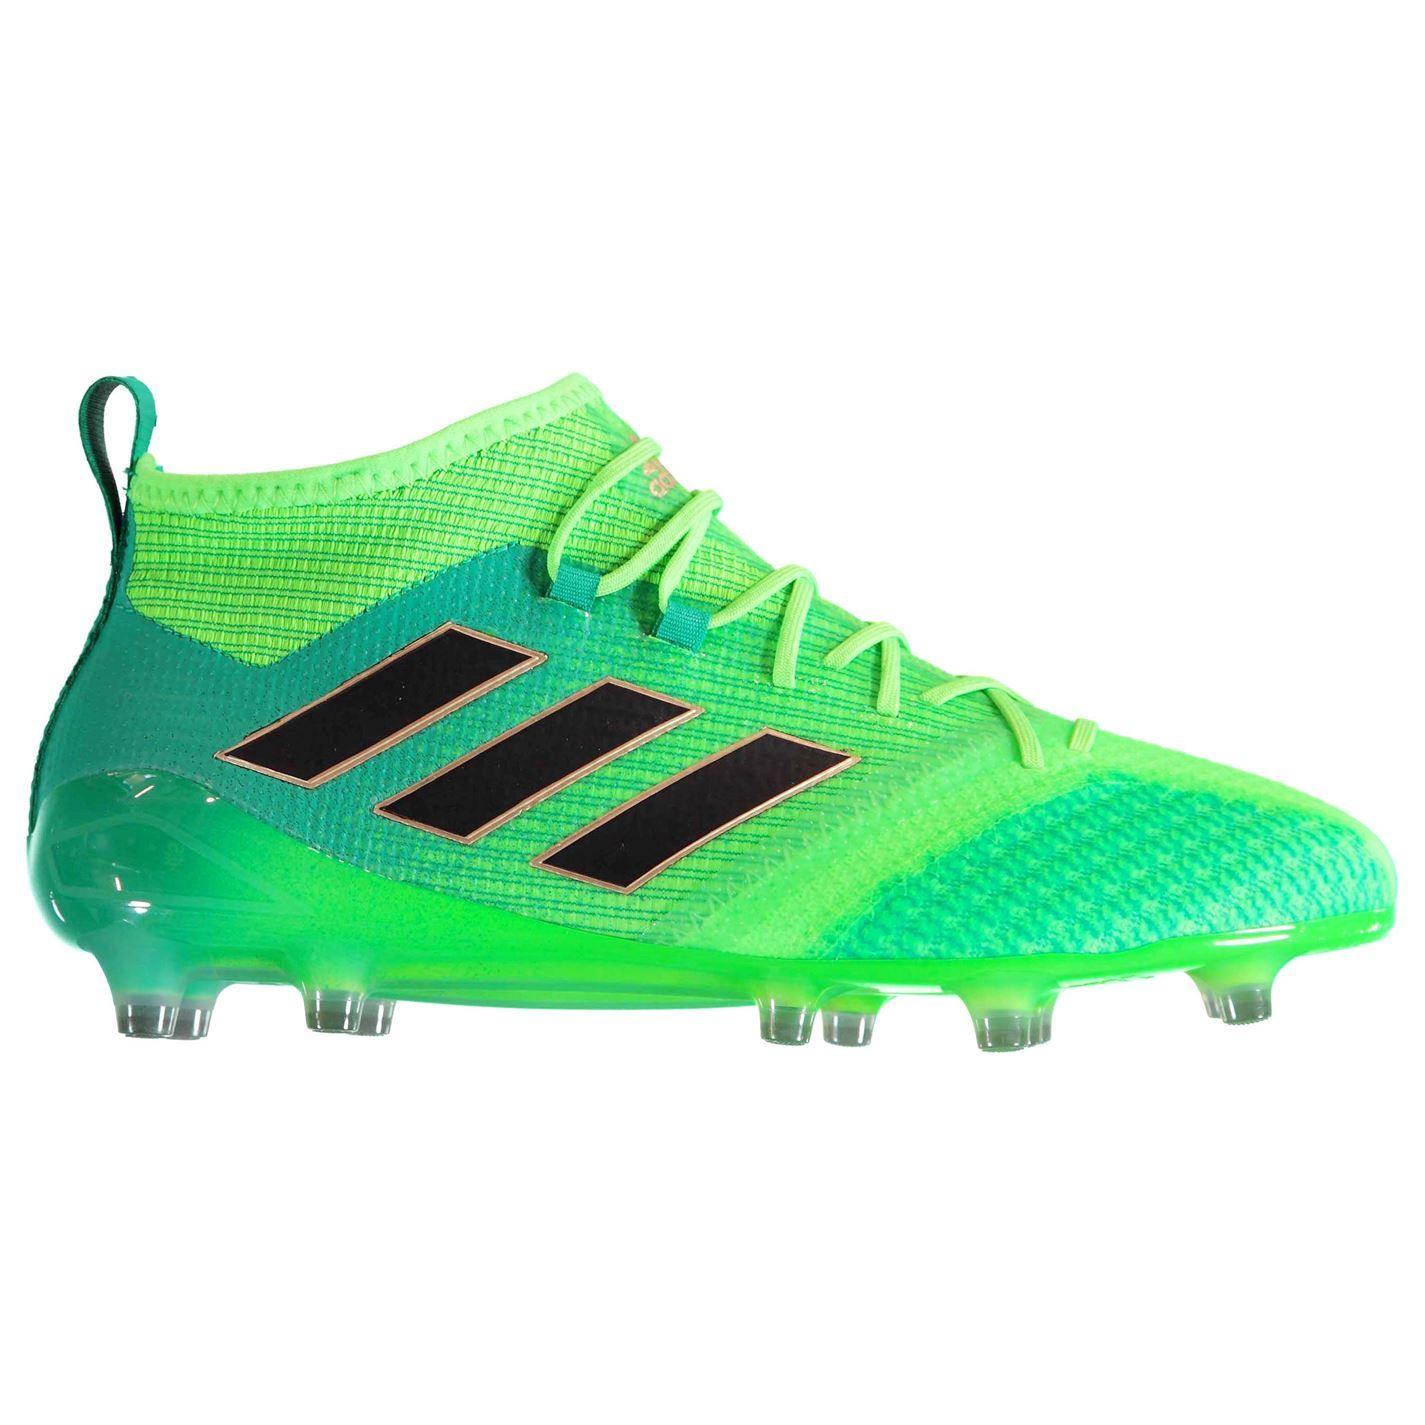 3f0aa02f538c top quality adidas ace 17 1 primeknit fg football boots 6431e 0f5b3